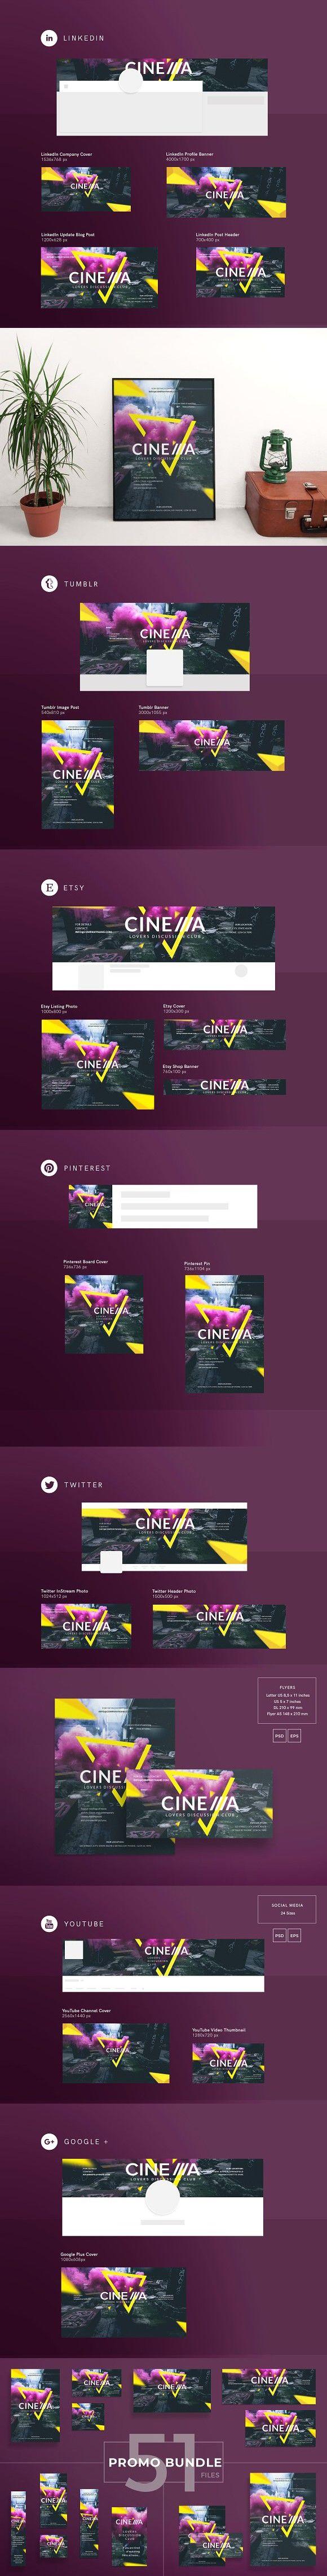 promo bundle cinema club club design pinterest social media